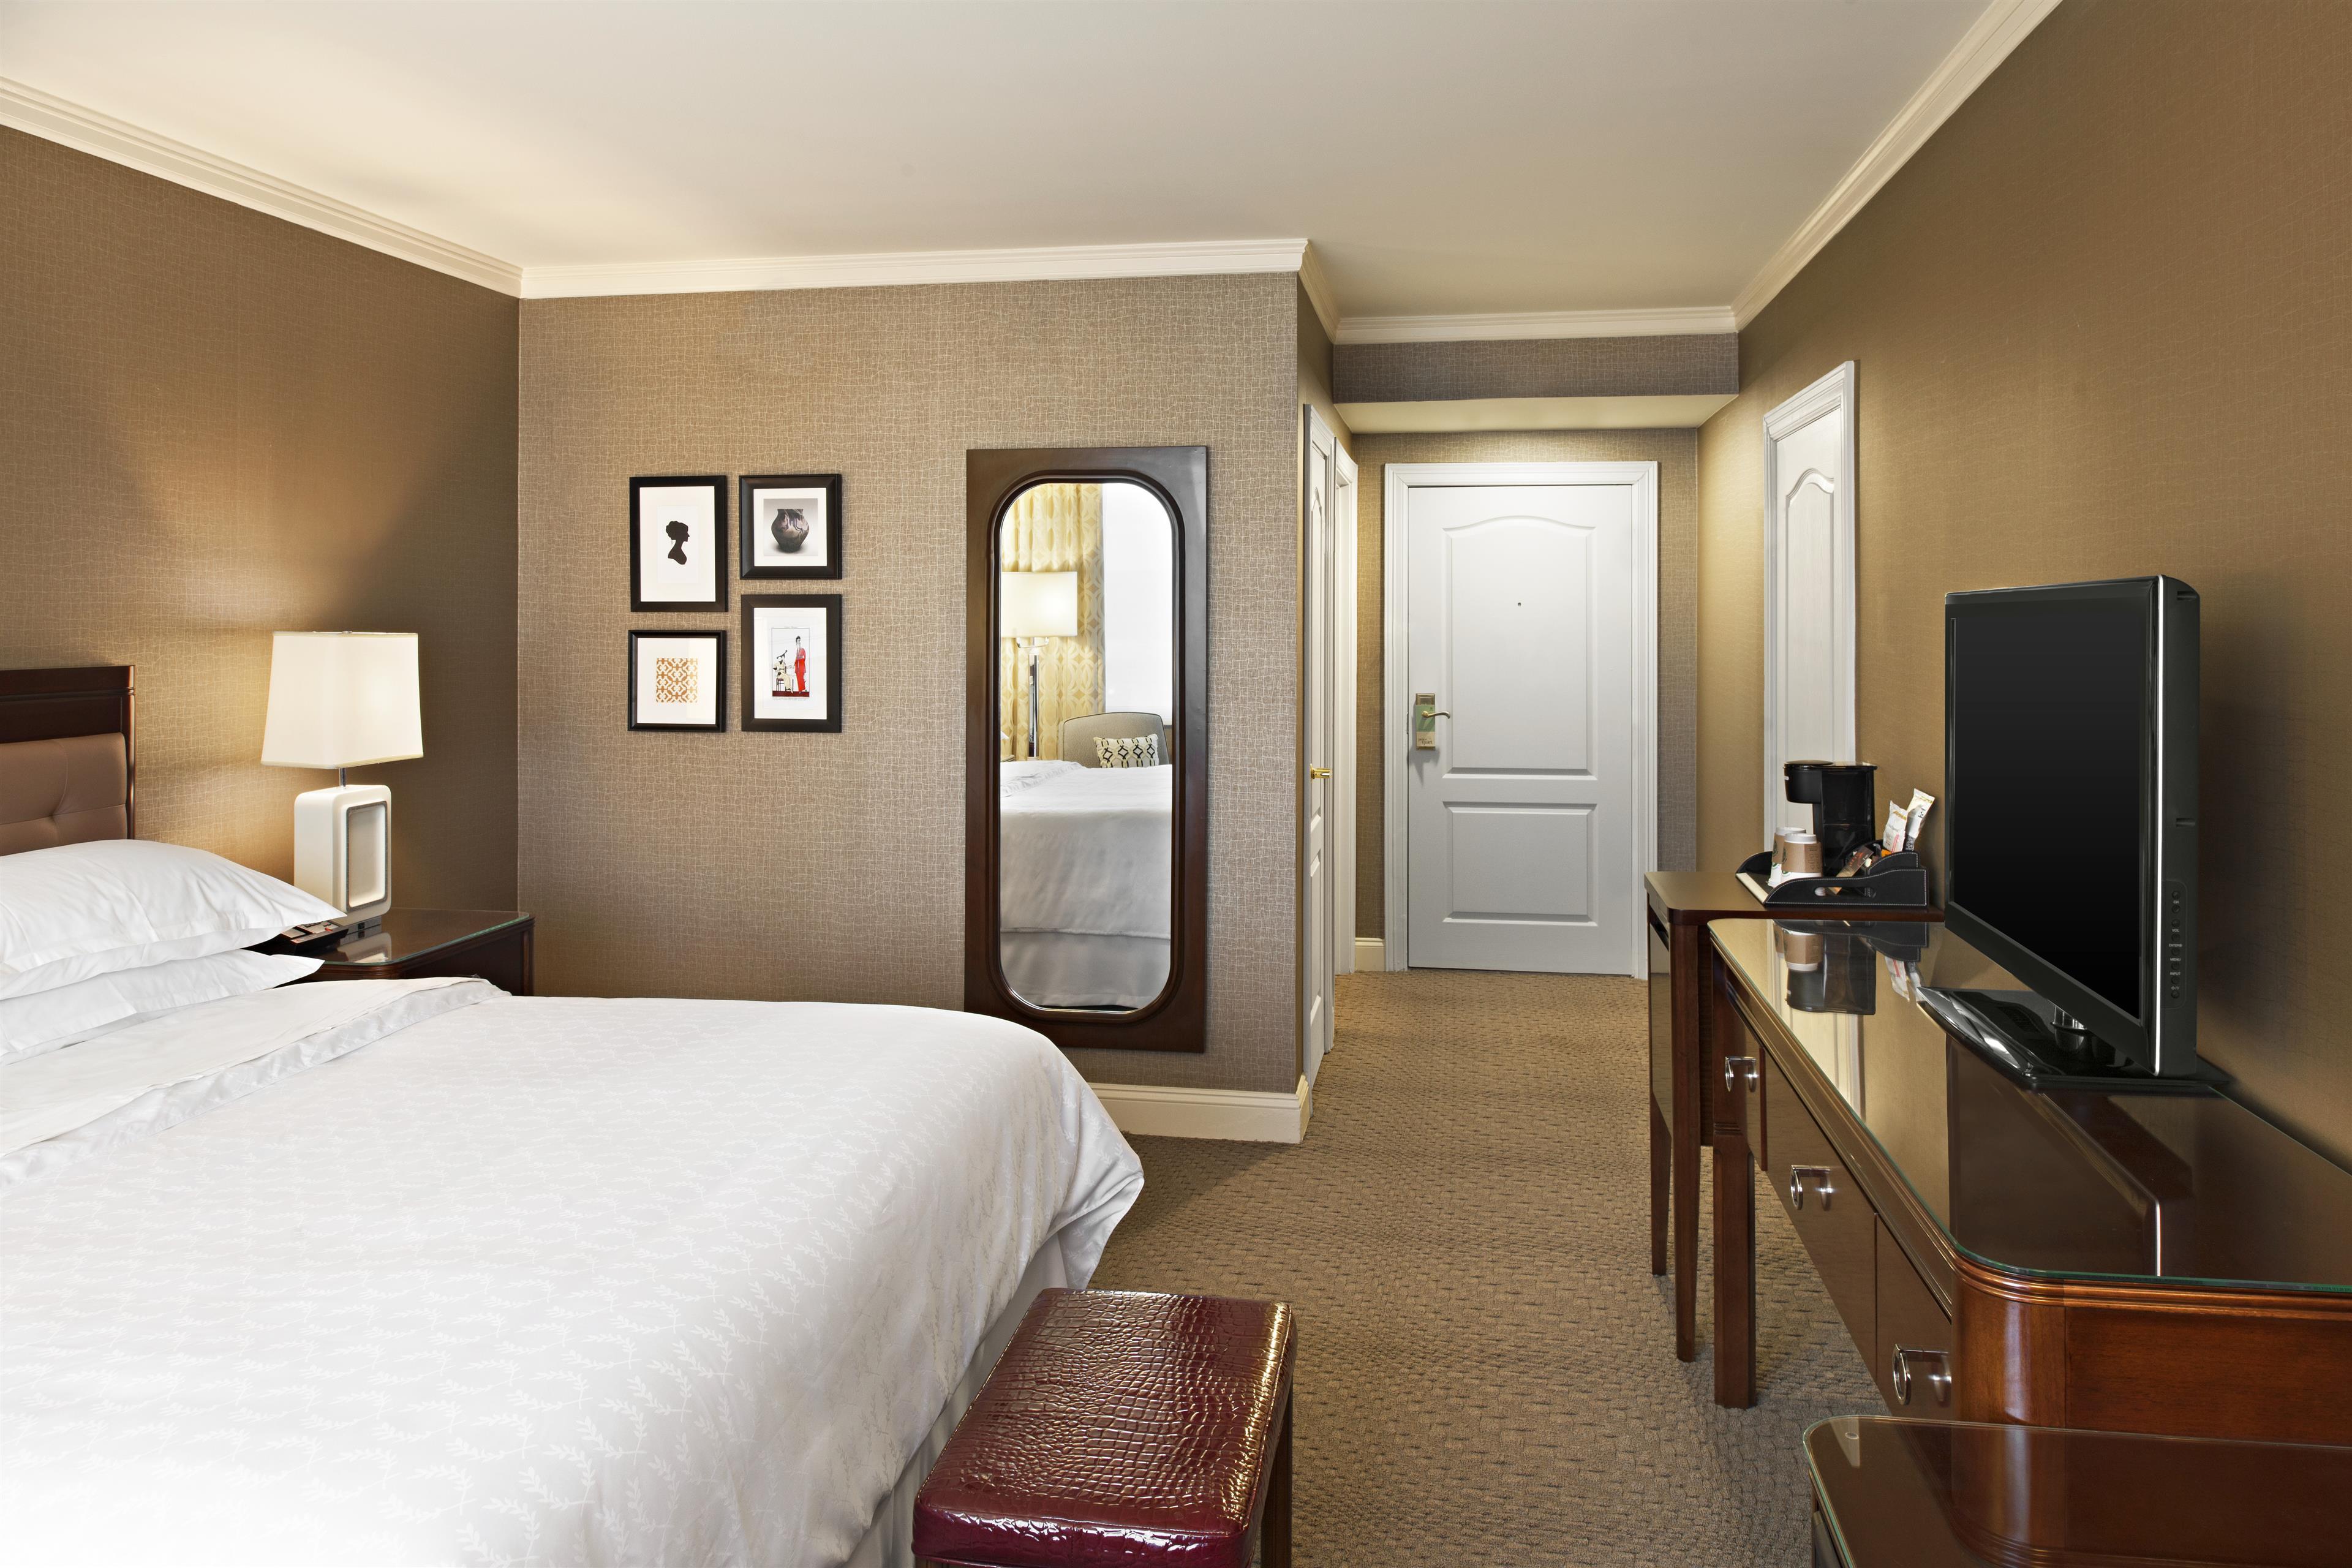 Sheraton Wilmington South Hotel image 15